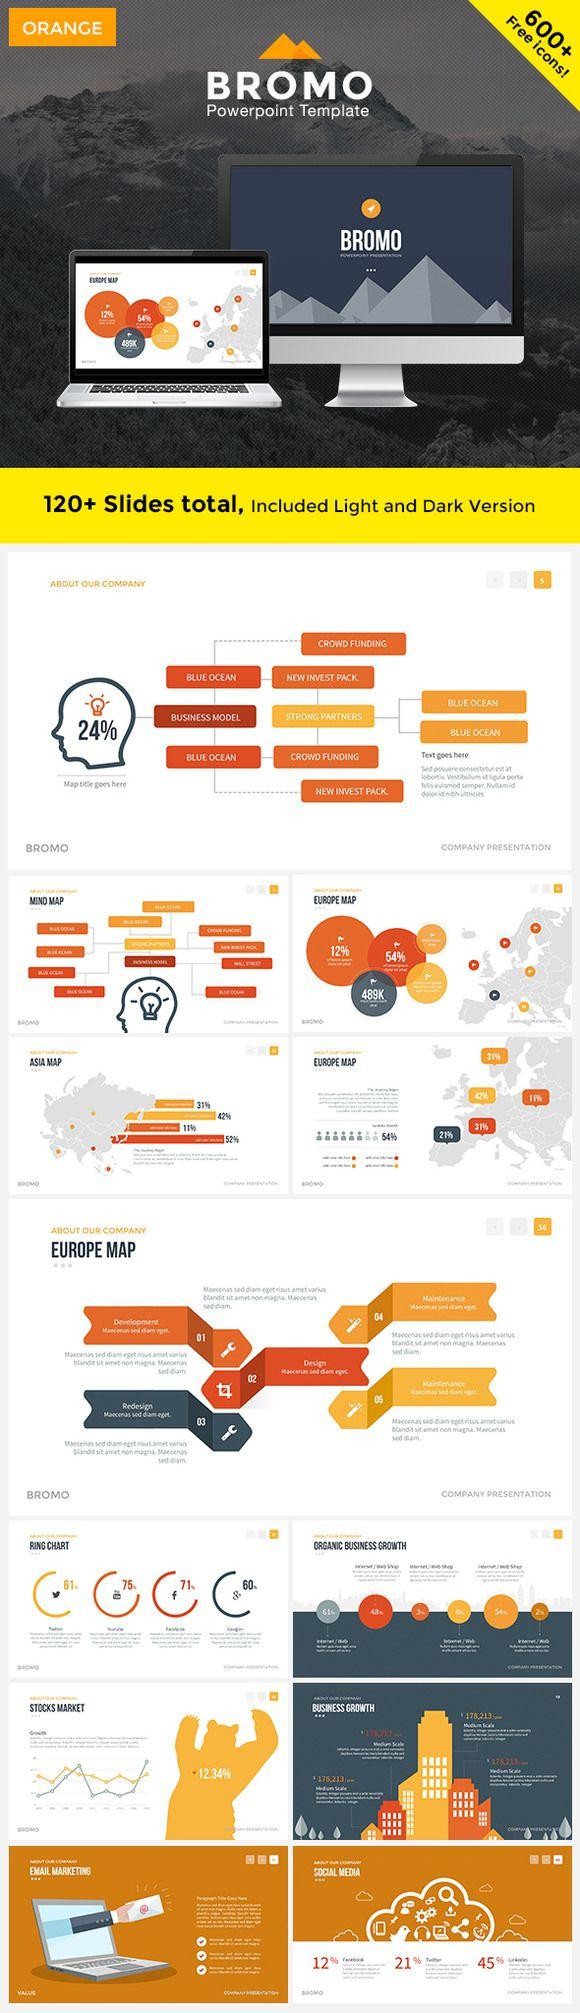 BROMO - Powerpoint Template (ORANGE) by slidecartel on Creative Market